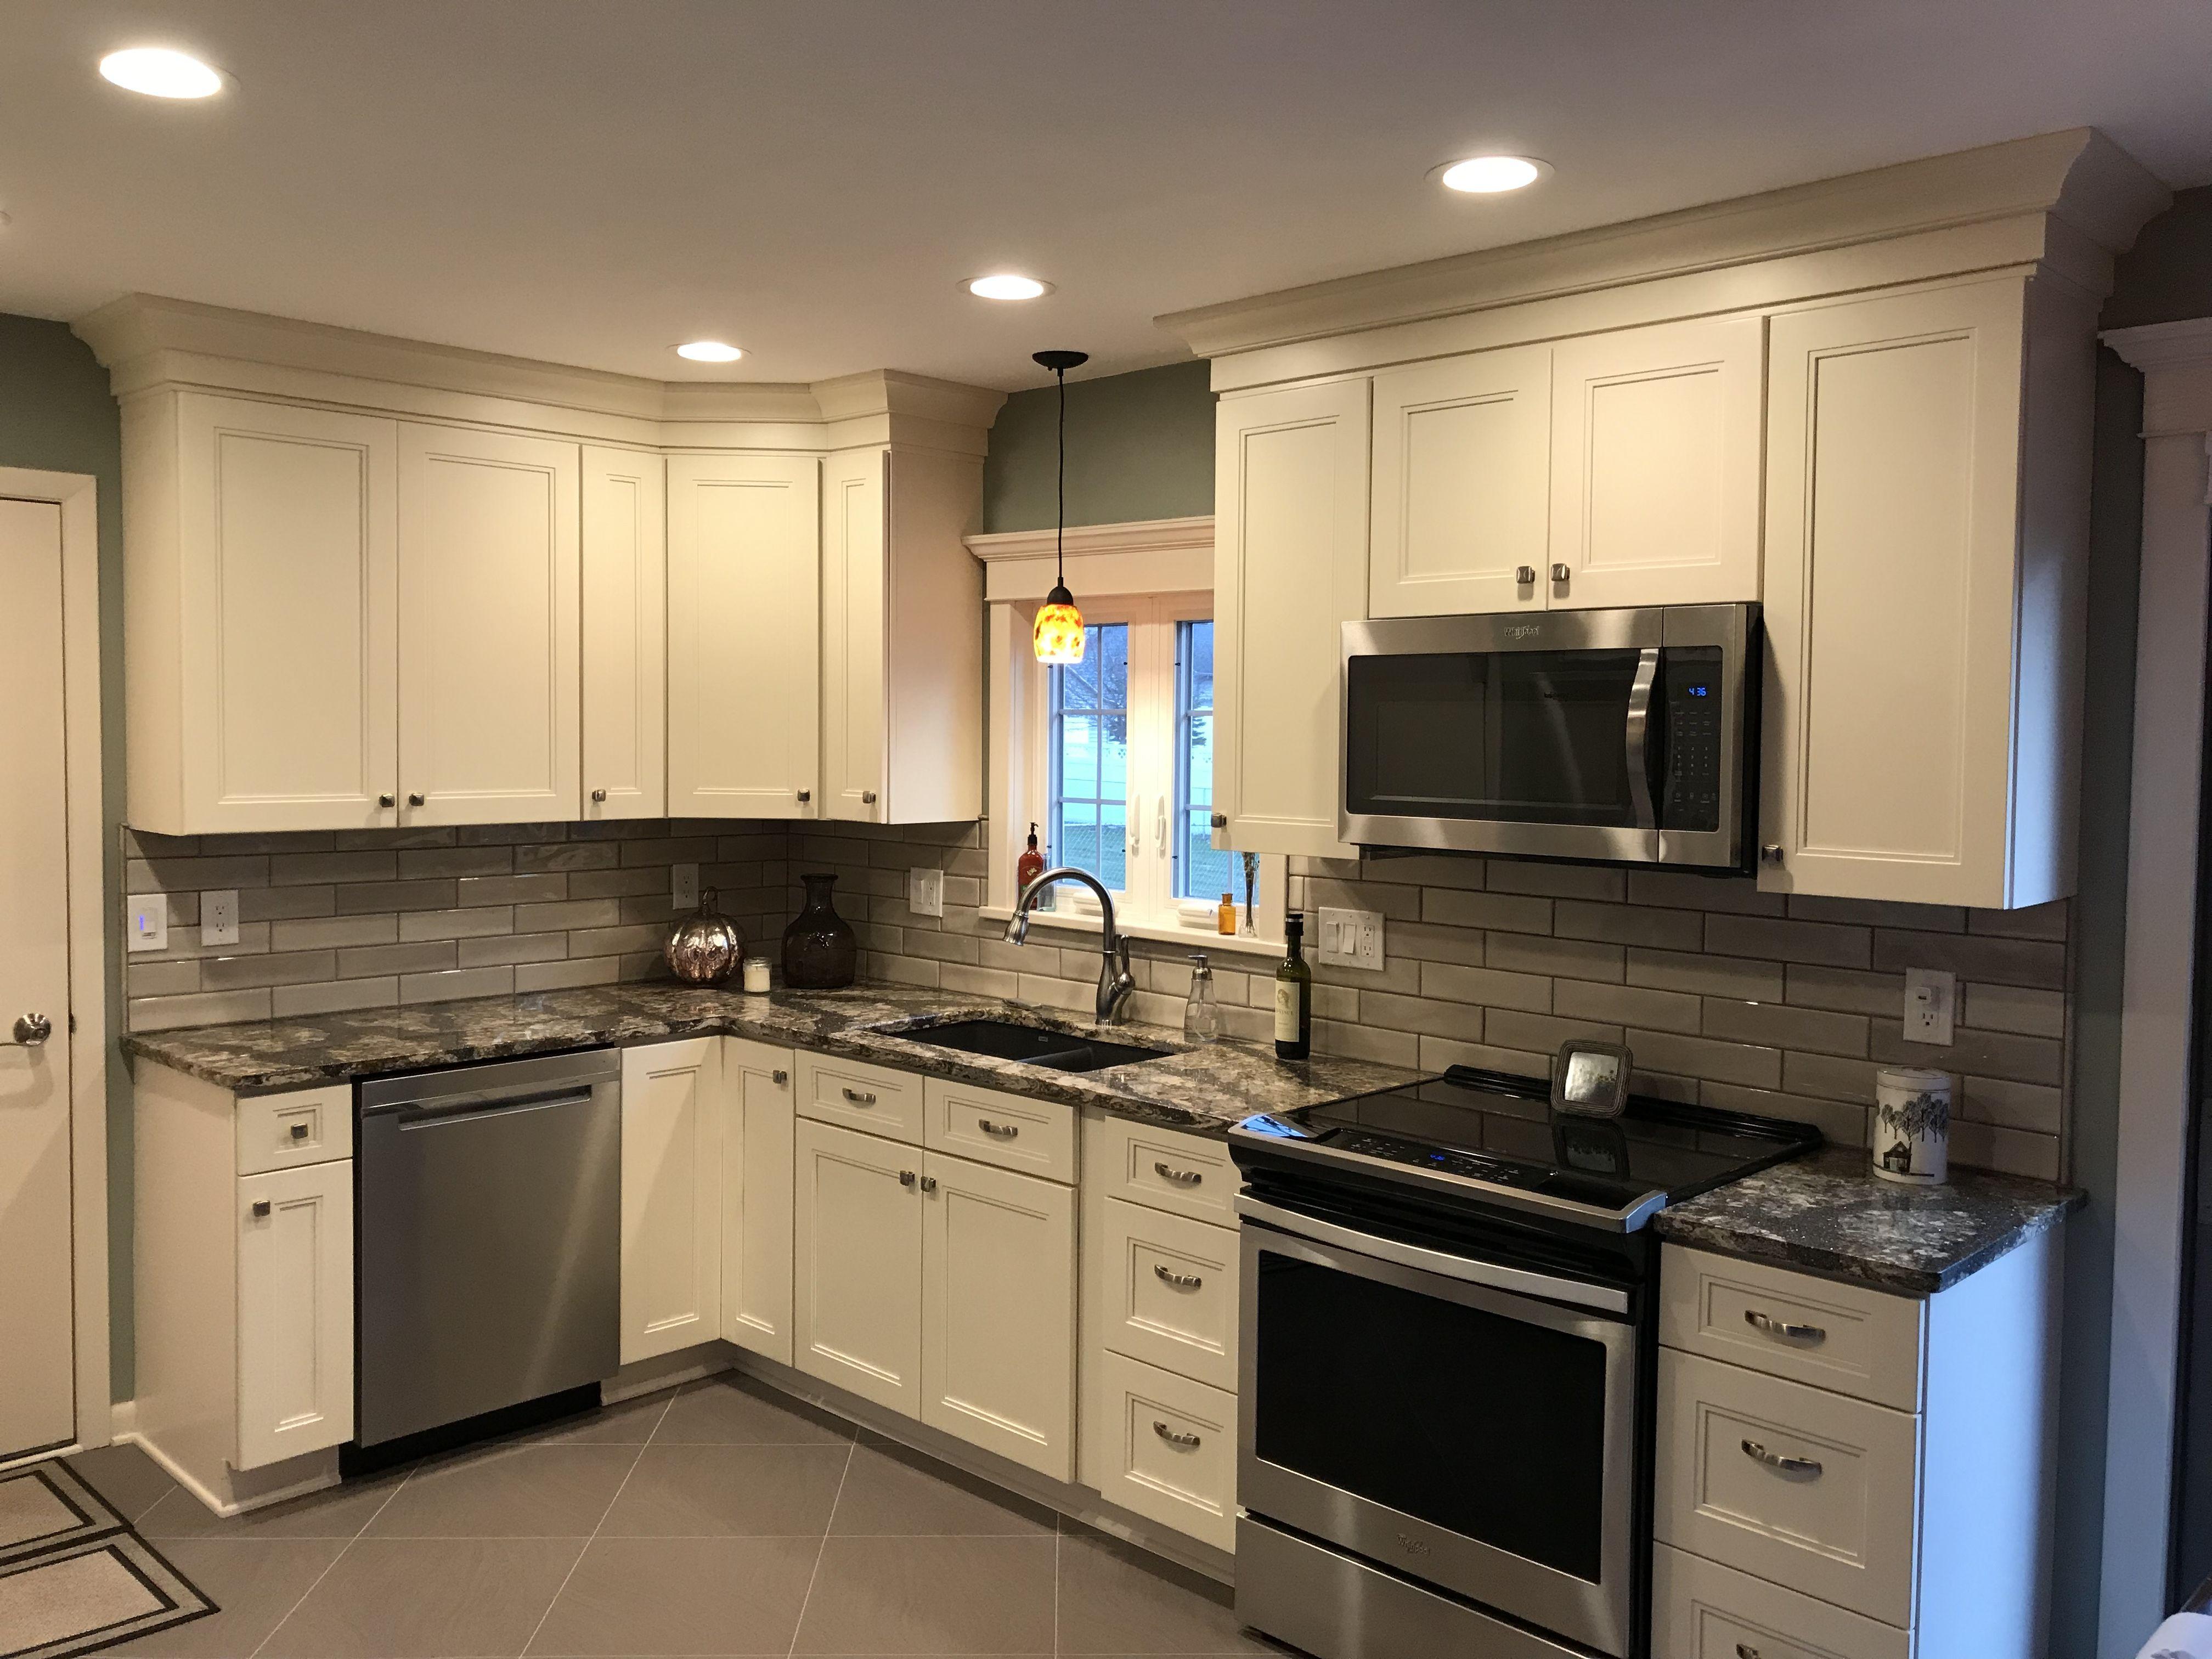 Elegant Pearl Cabinets From Cnc Kitchen Interior Kitchen Cabinet